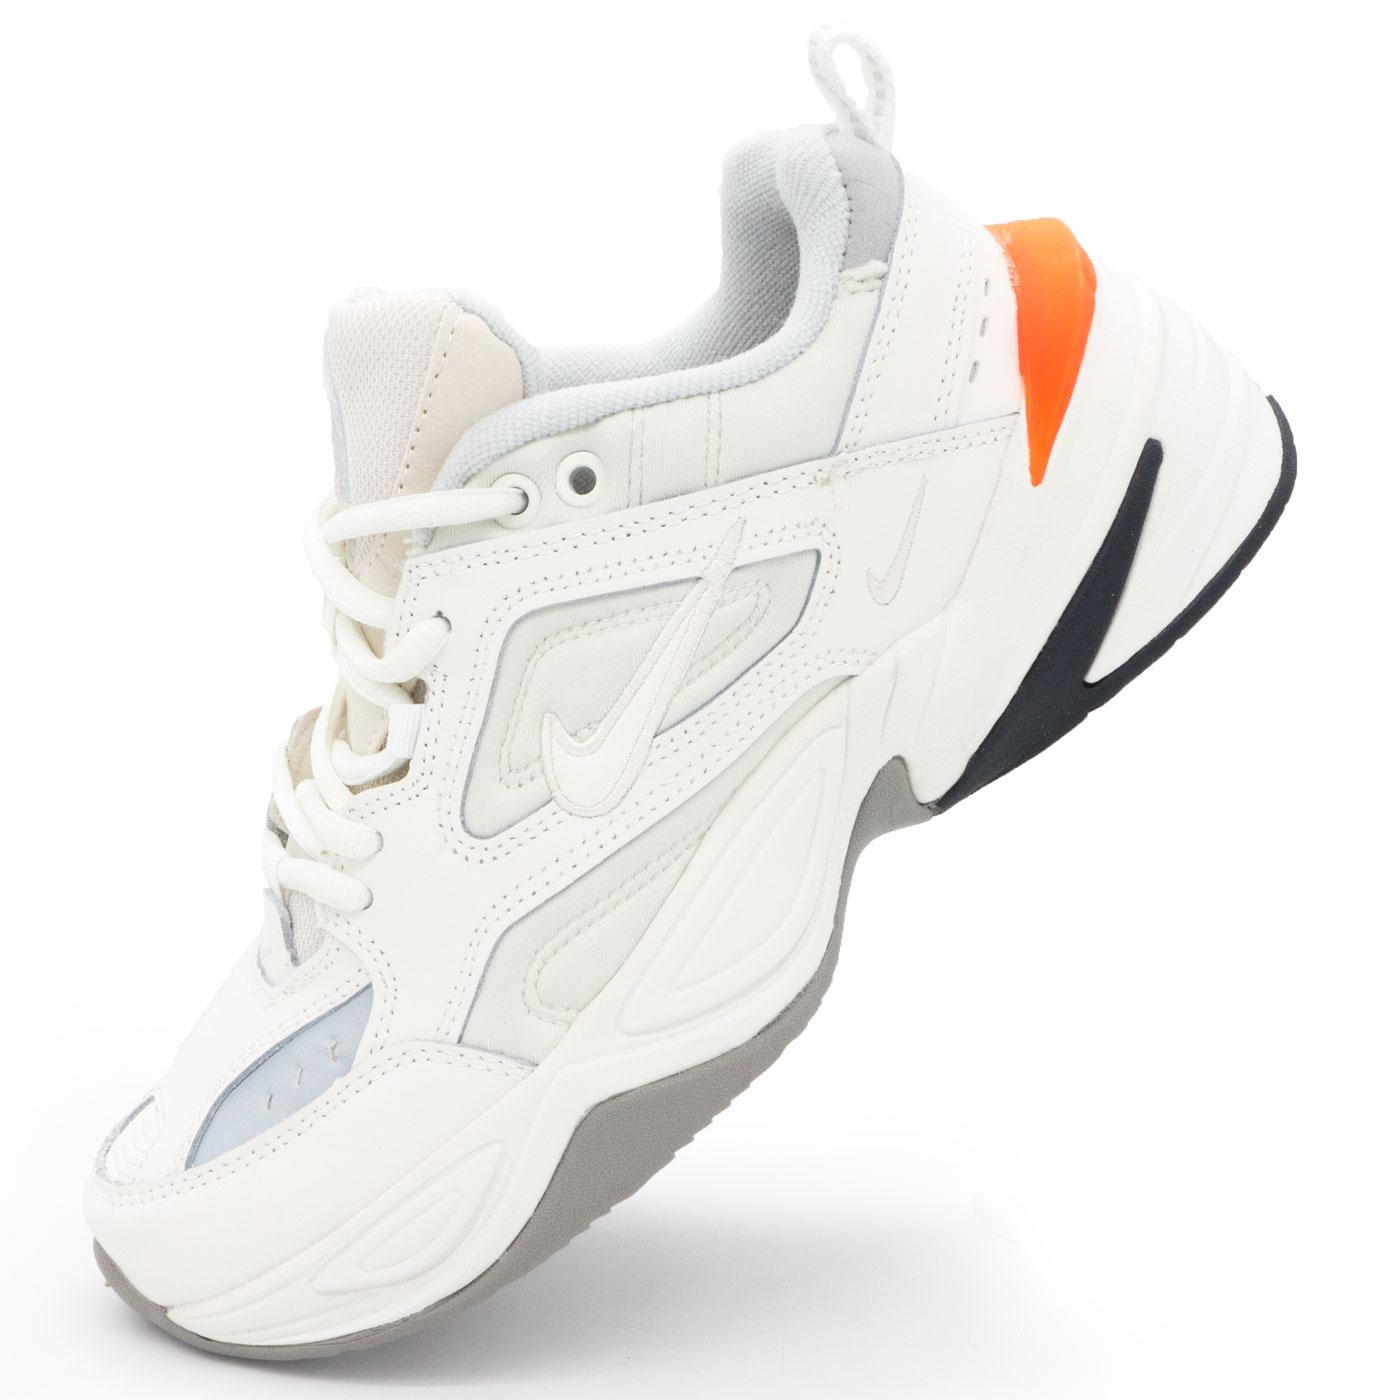 3bd6faf0 Кроссовки Nike M2K Tekno белые с розовым, купить Найк M2K Текно в ...